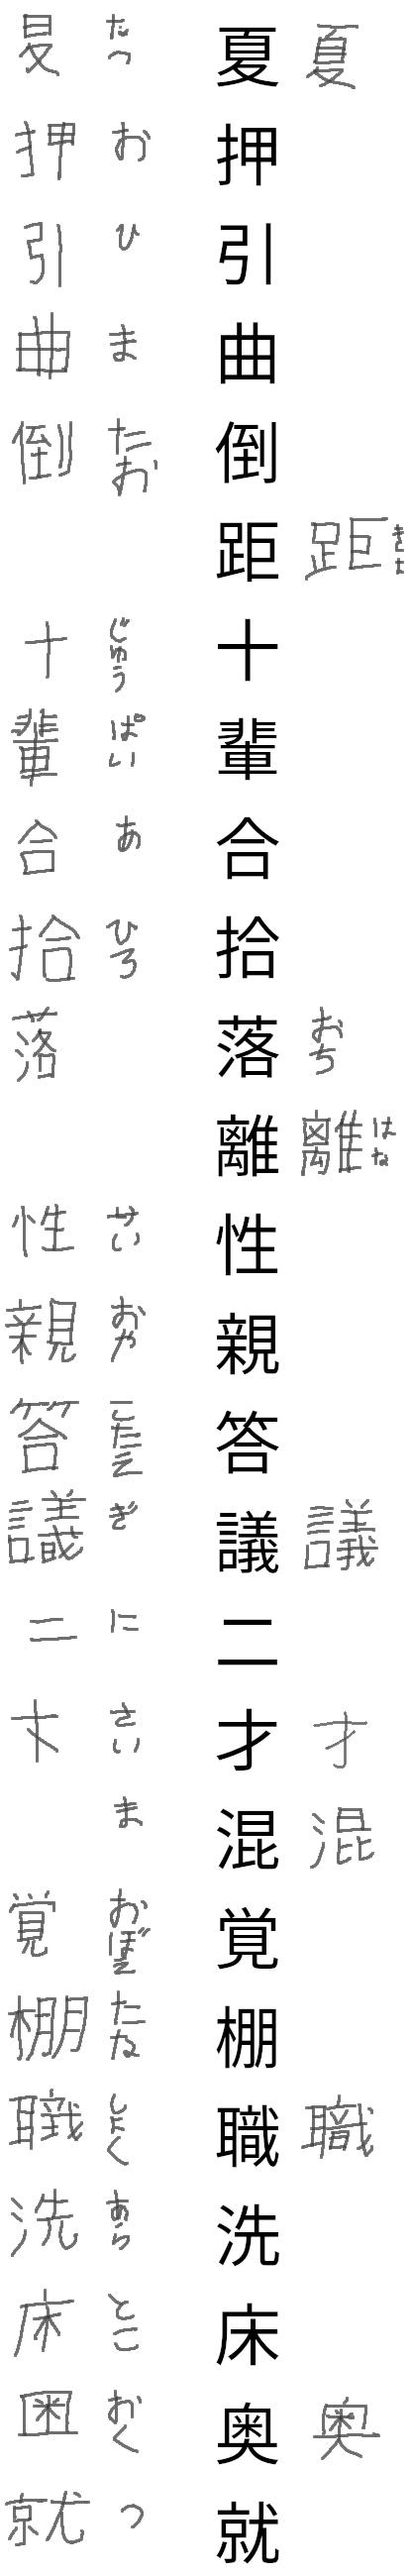 kanji test row 28